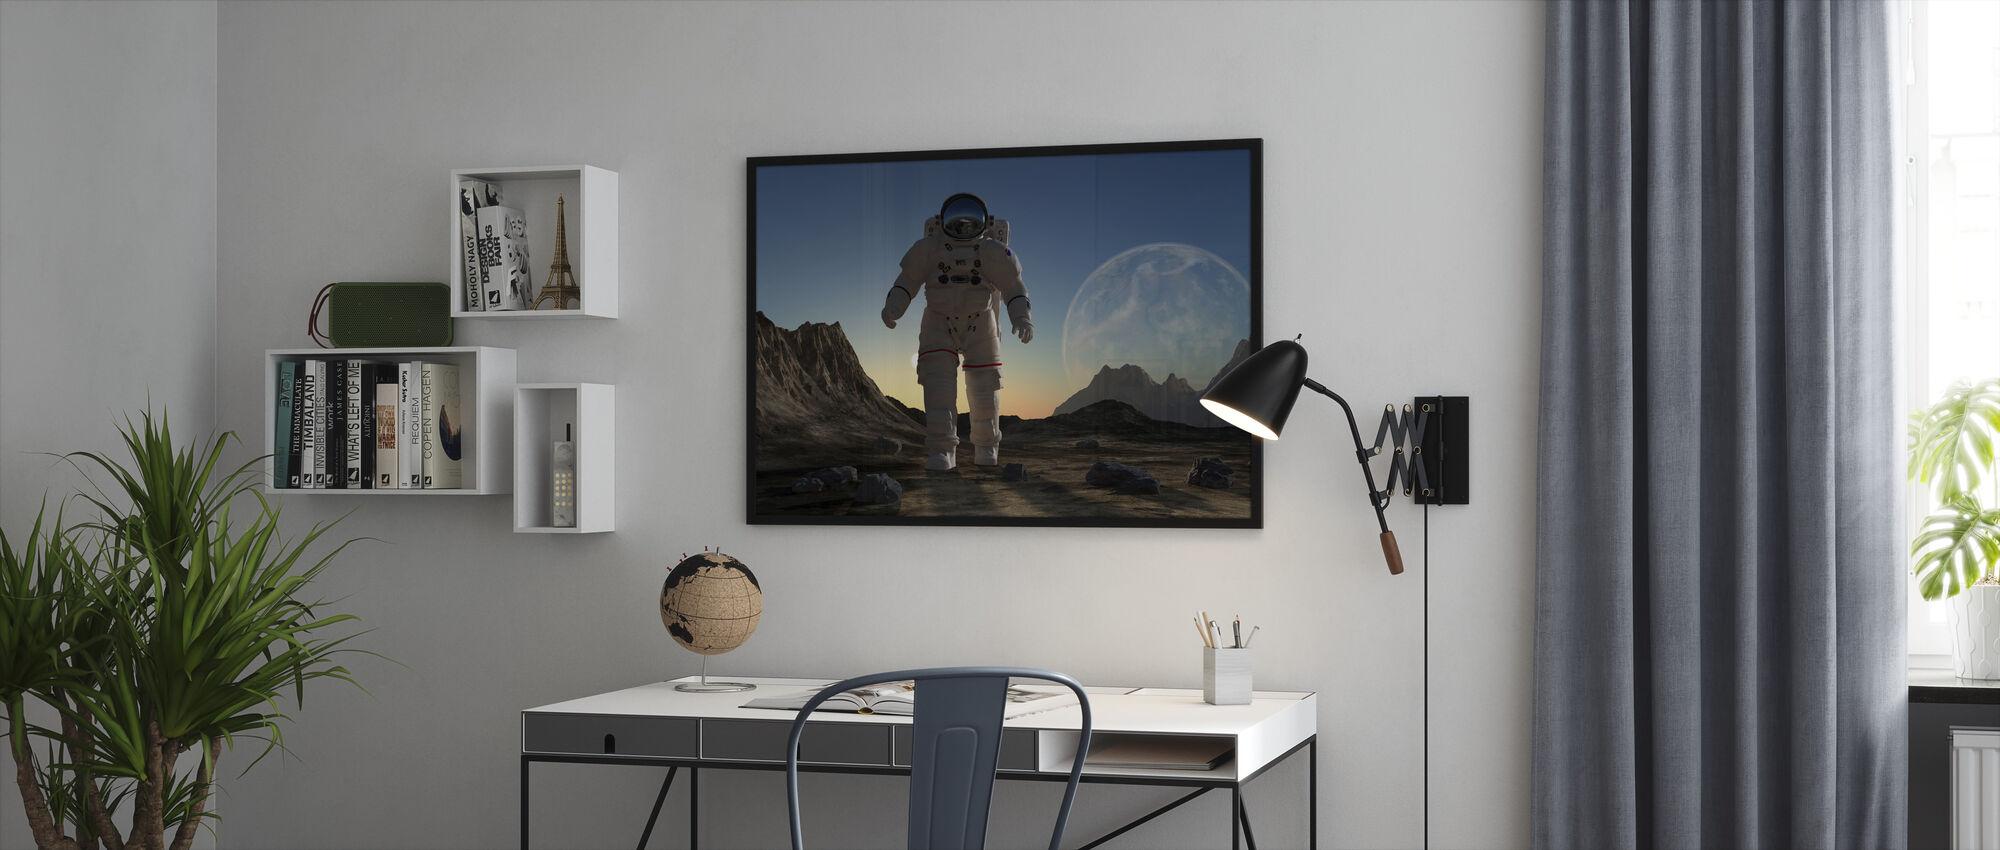 Astronaut i rummet Sunset - Indrammet billede - Kontor